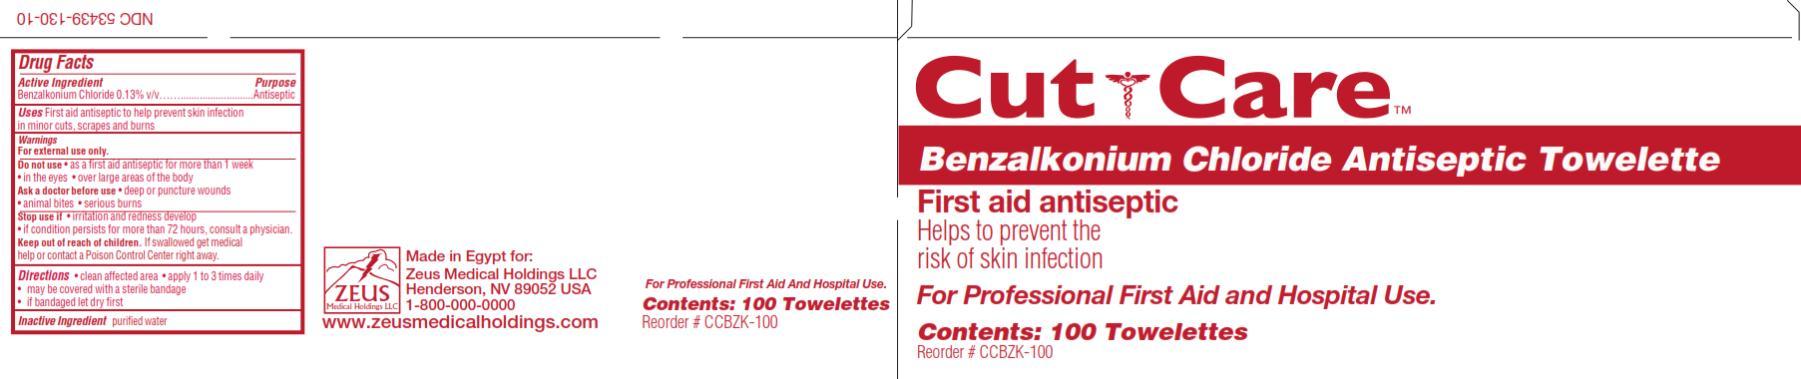 Cut Care Benzalkonium Chloride Antiseptic (Benzalkonium Chloride) Swab [Zeus Medical Holdings Llc]